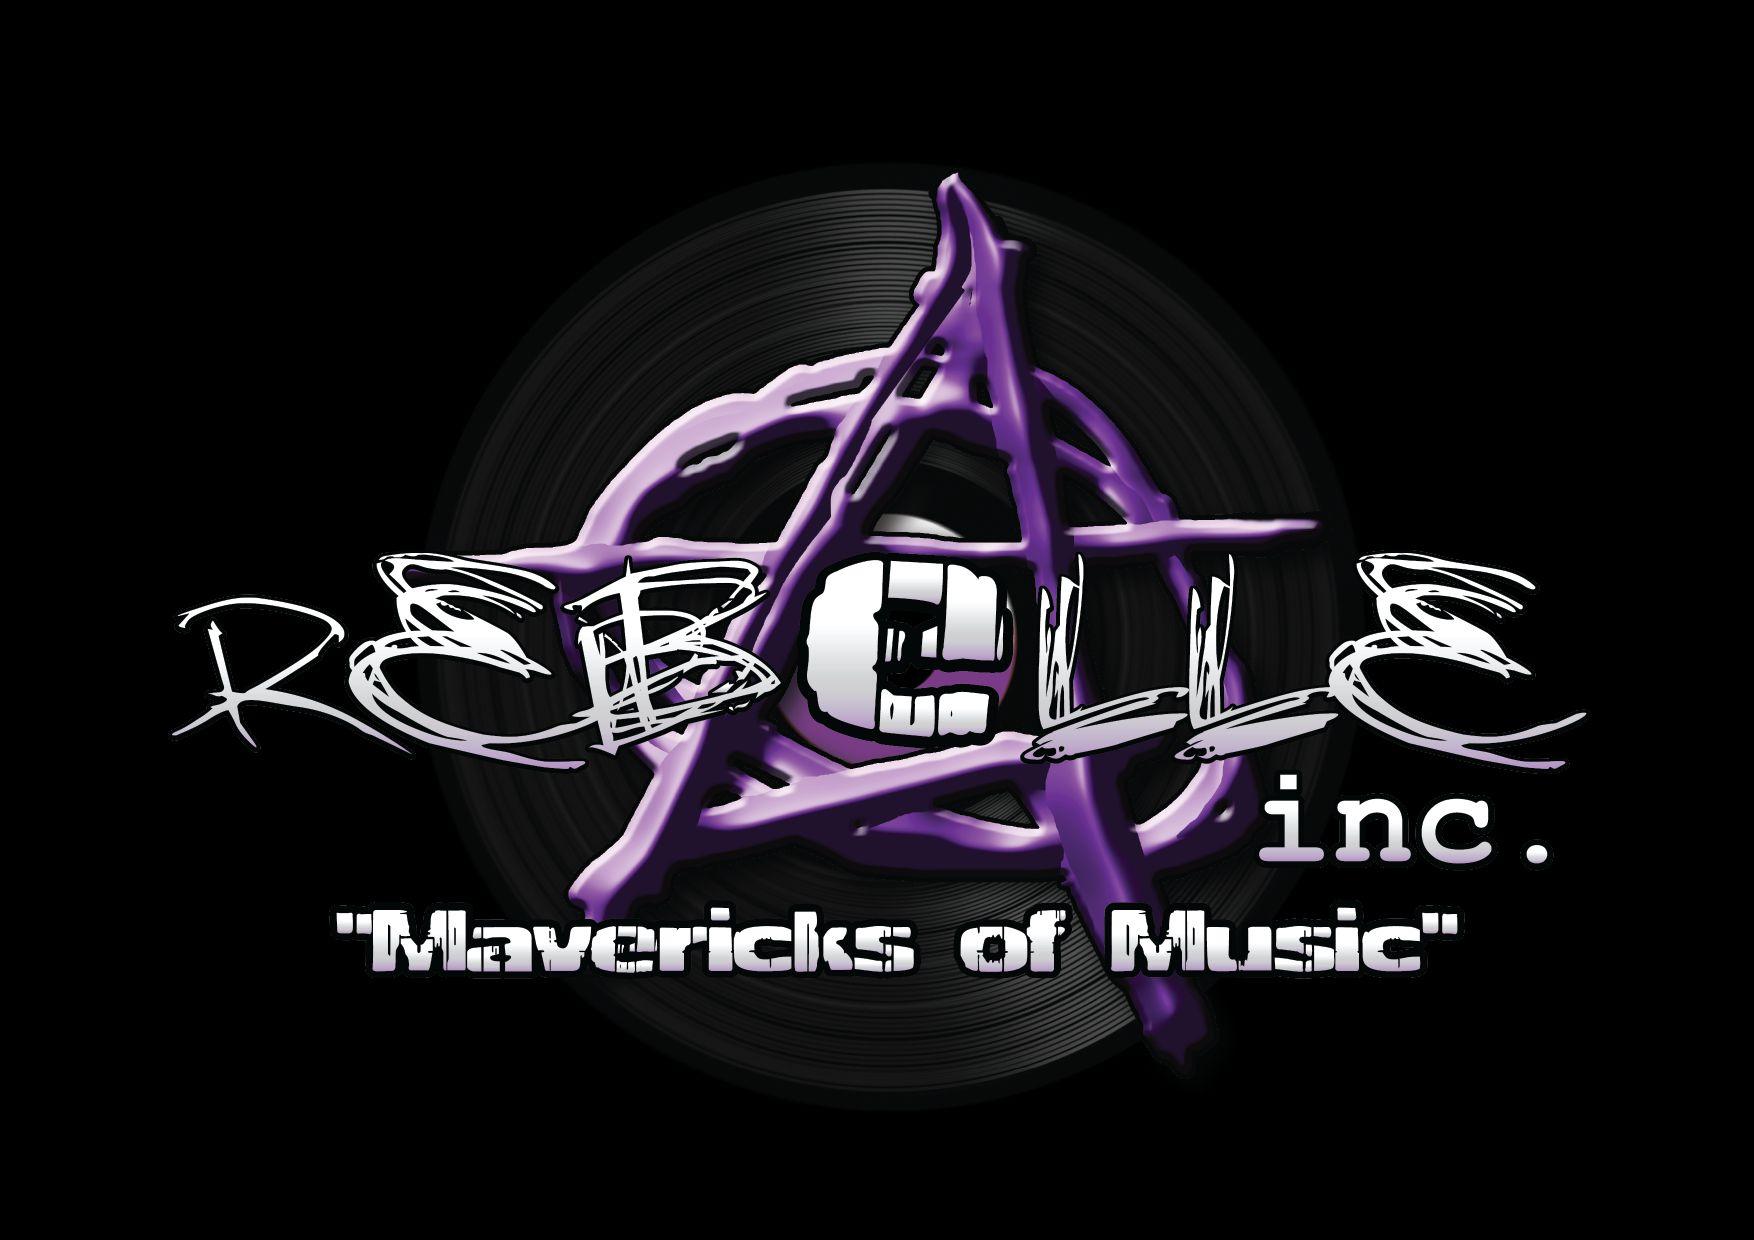 Rebelle Inc